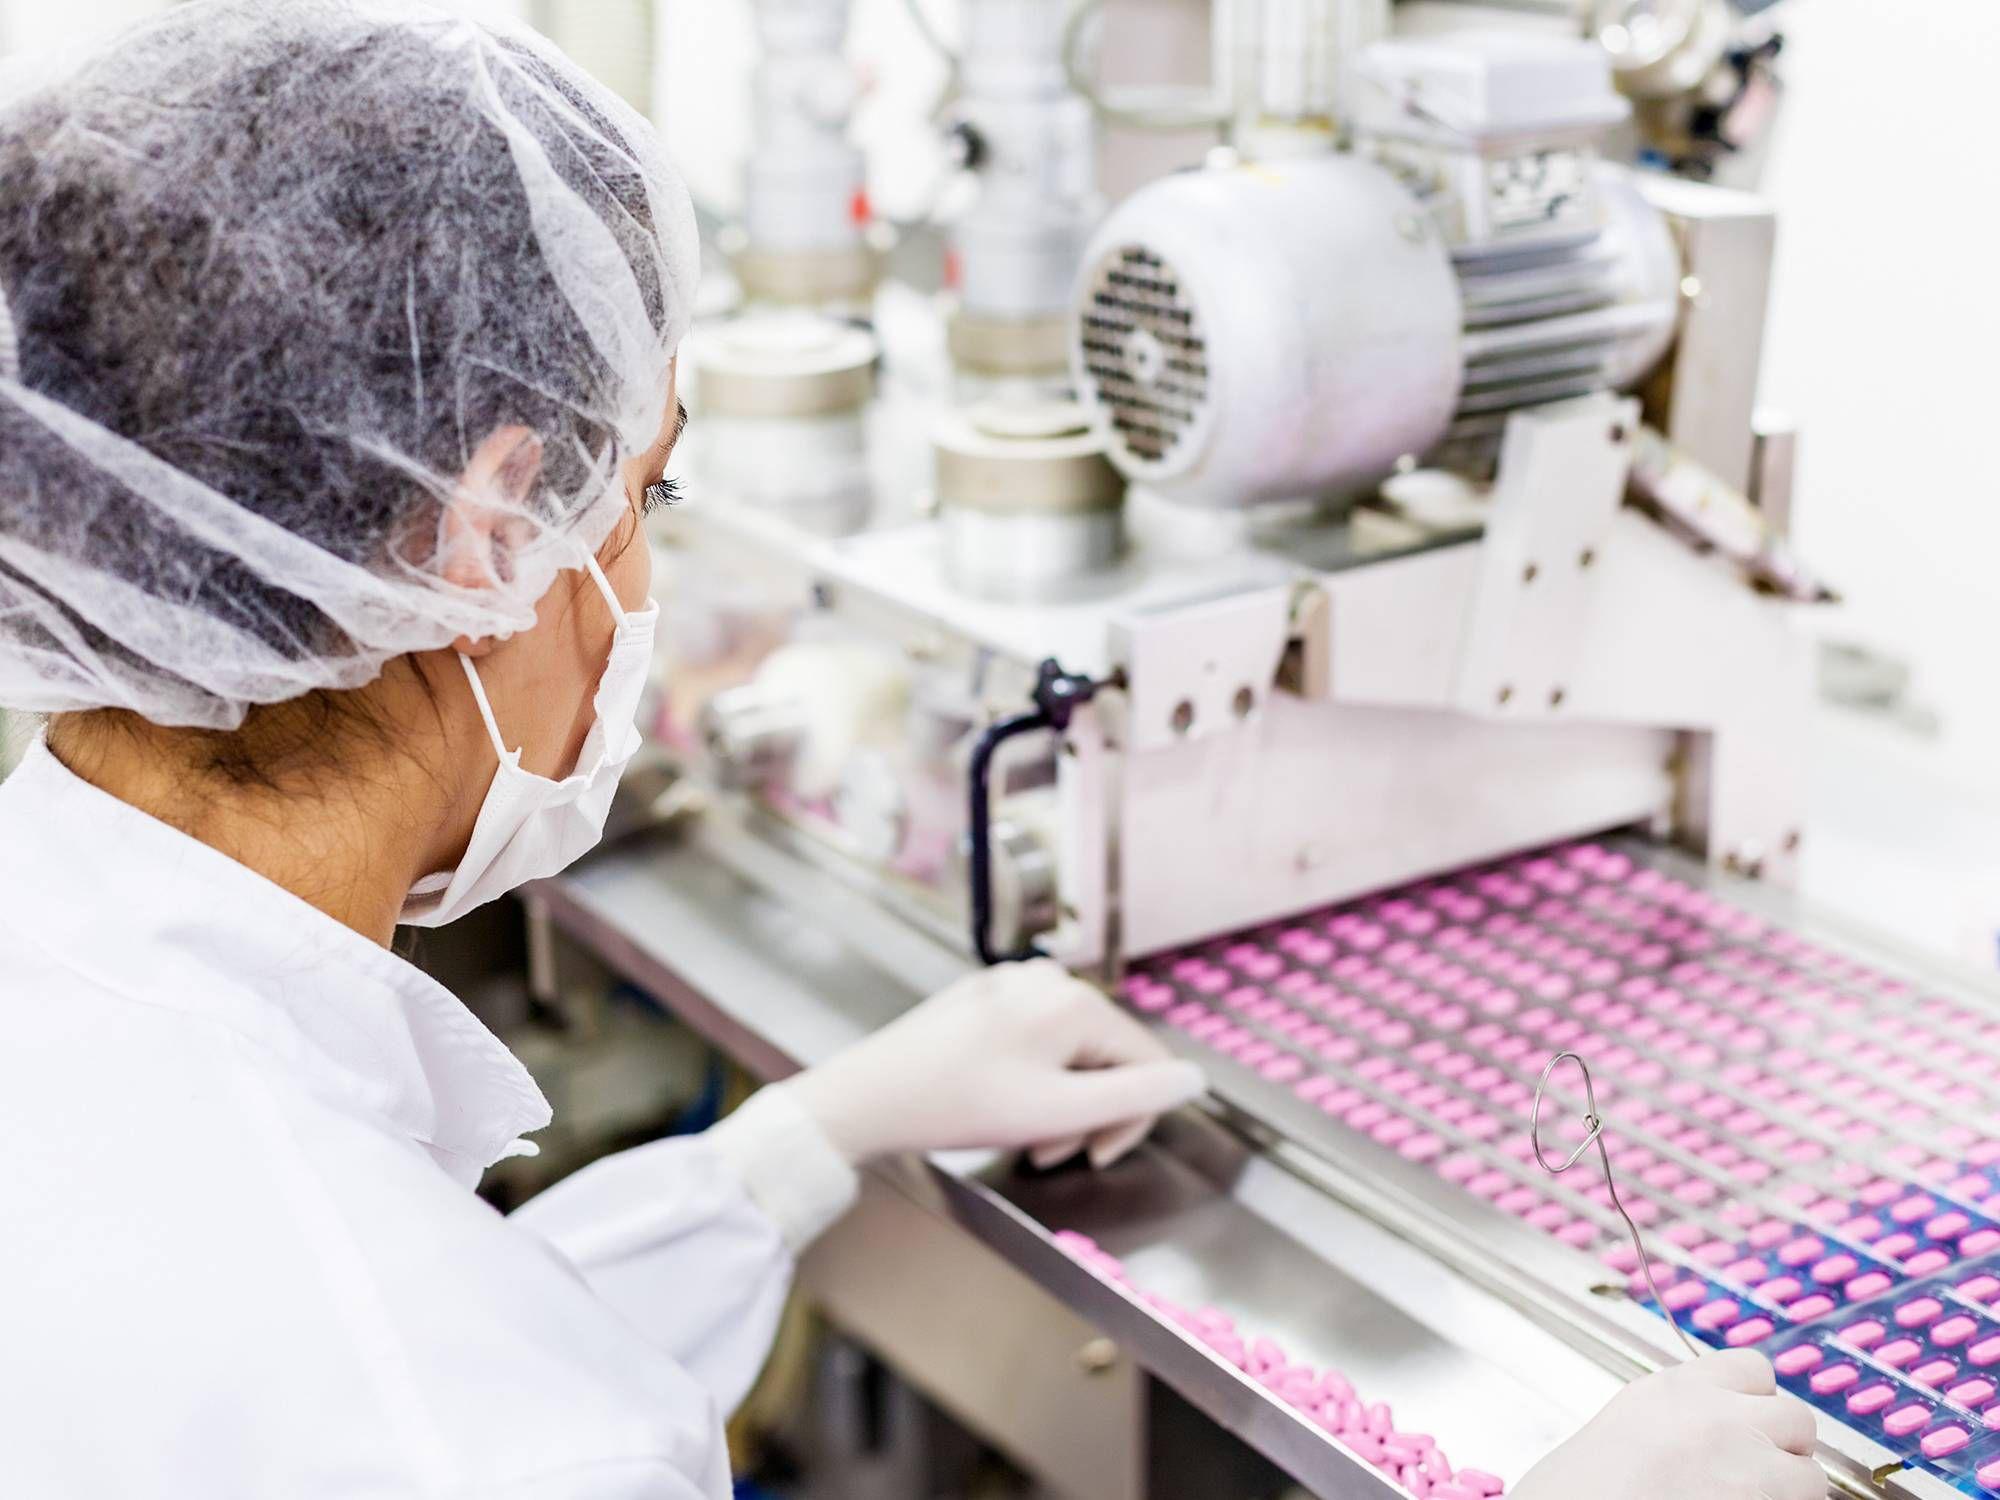 testo Saveris生命科学环境监测系统在制药领域的应用